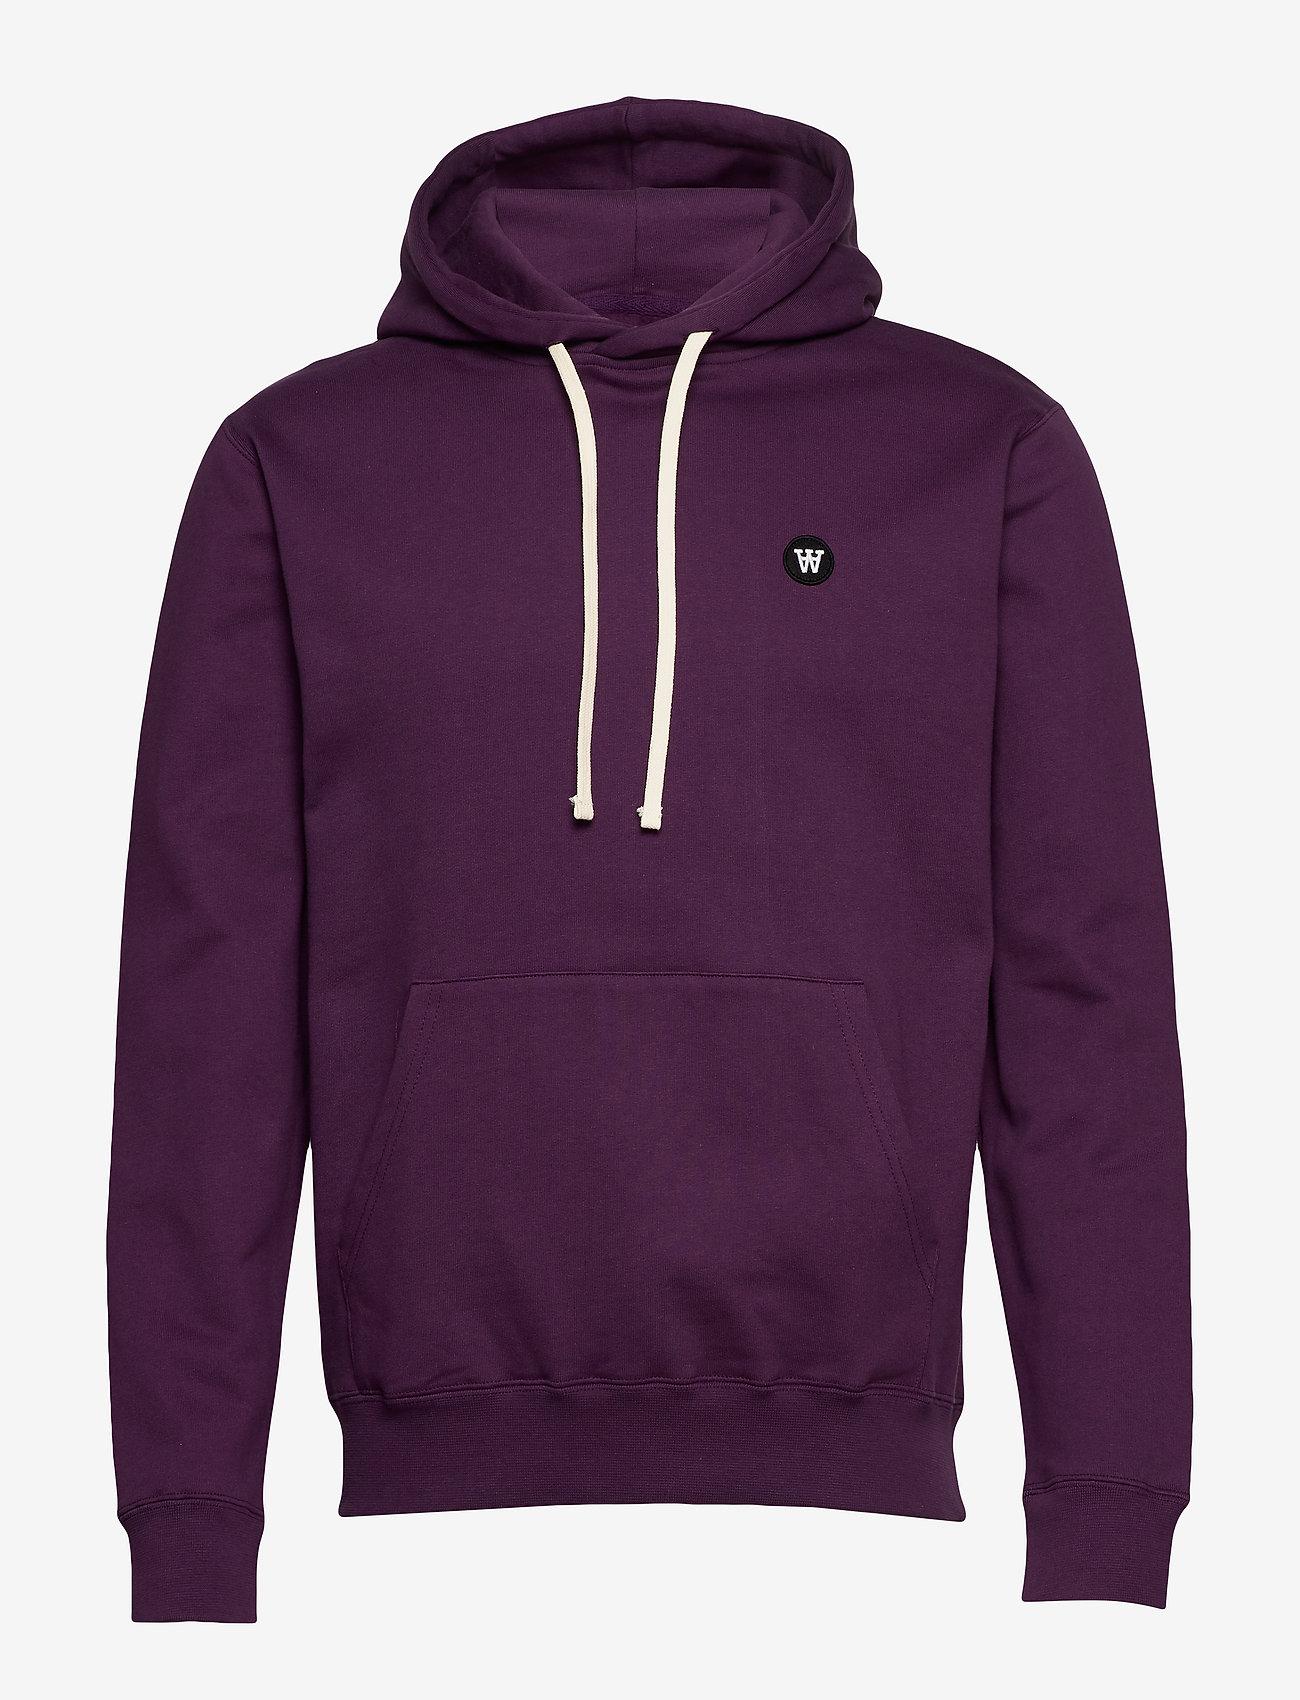 Wood Wood - Ian hoodie - basic sweatshirts - aubergine